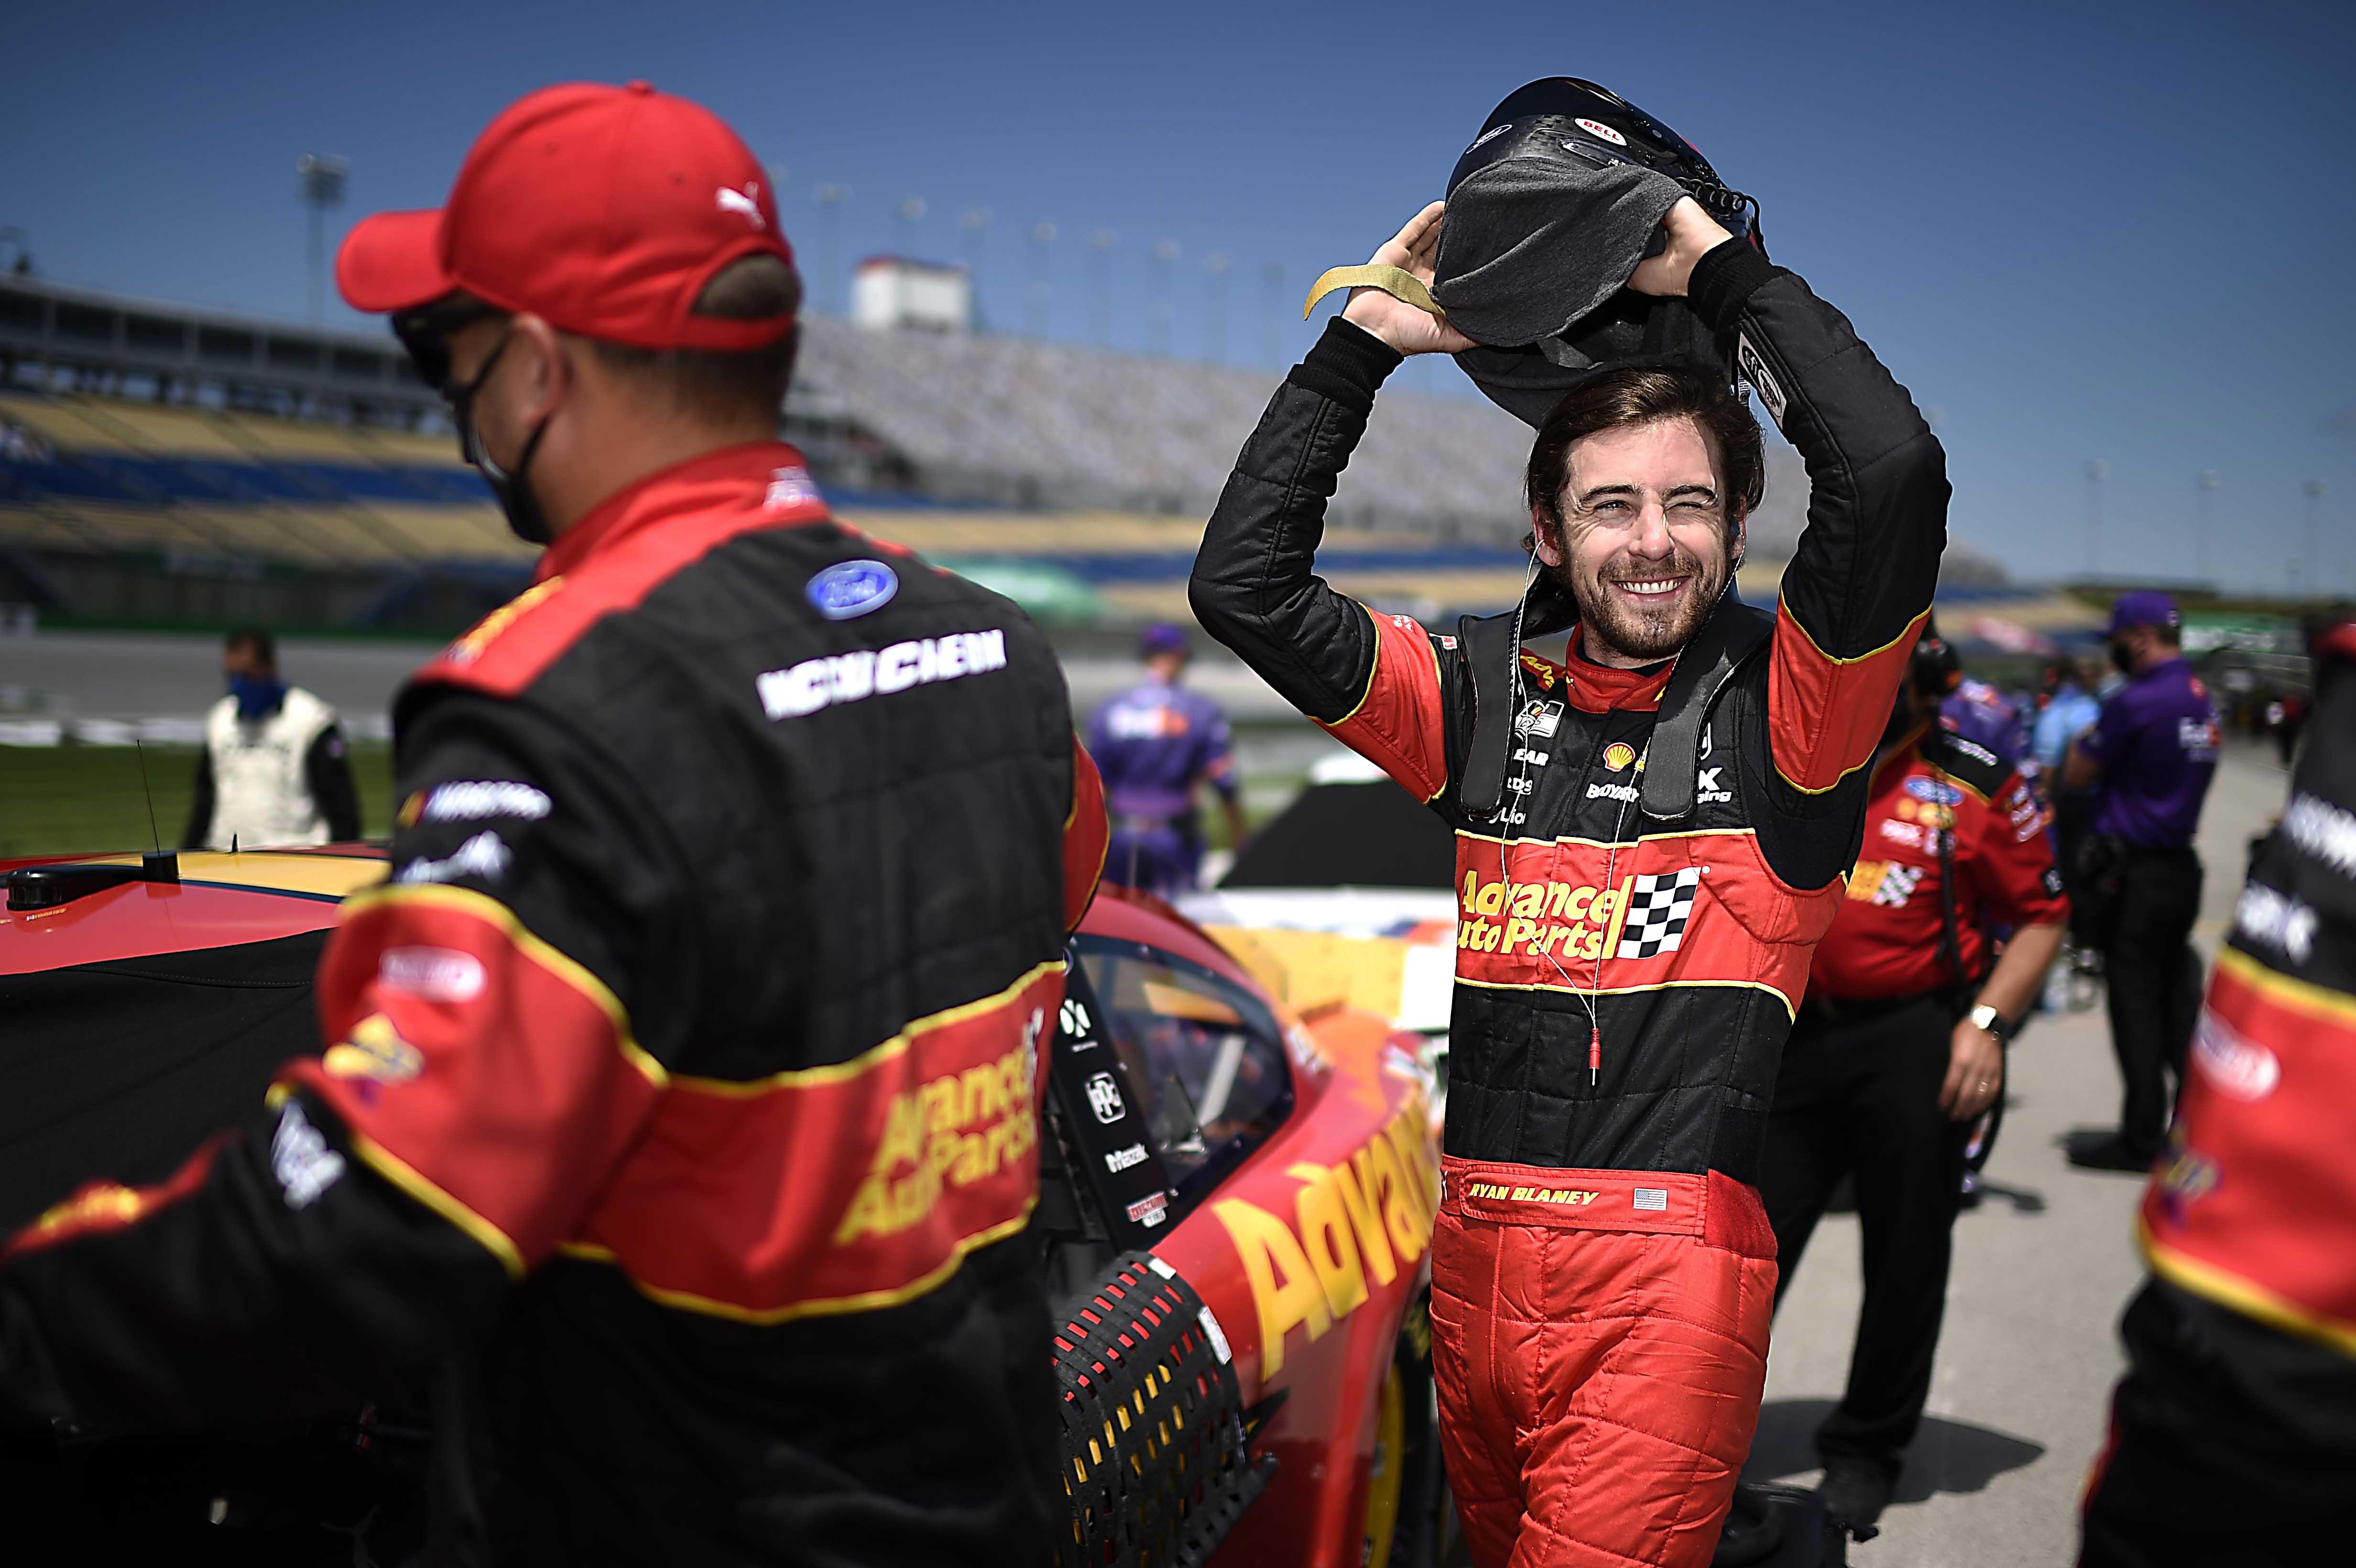 Ryan Blaney - NASCAR driver